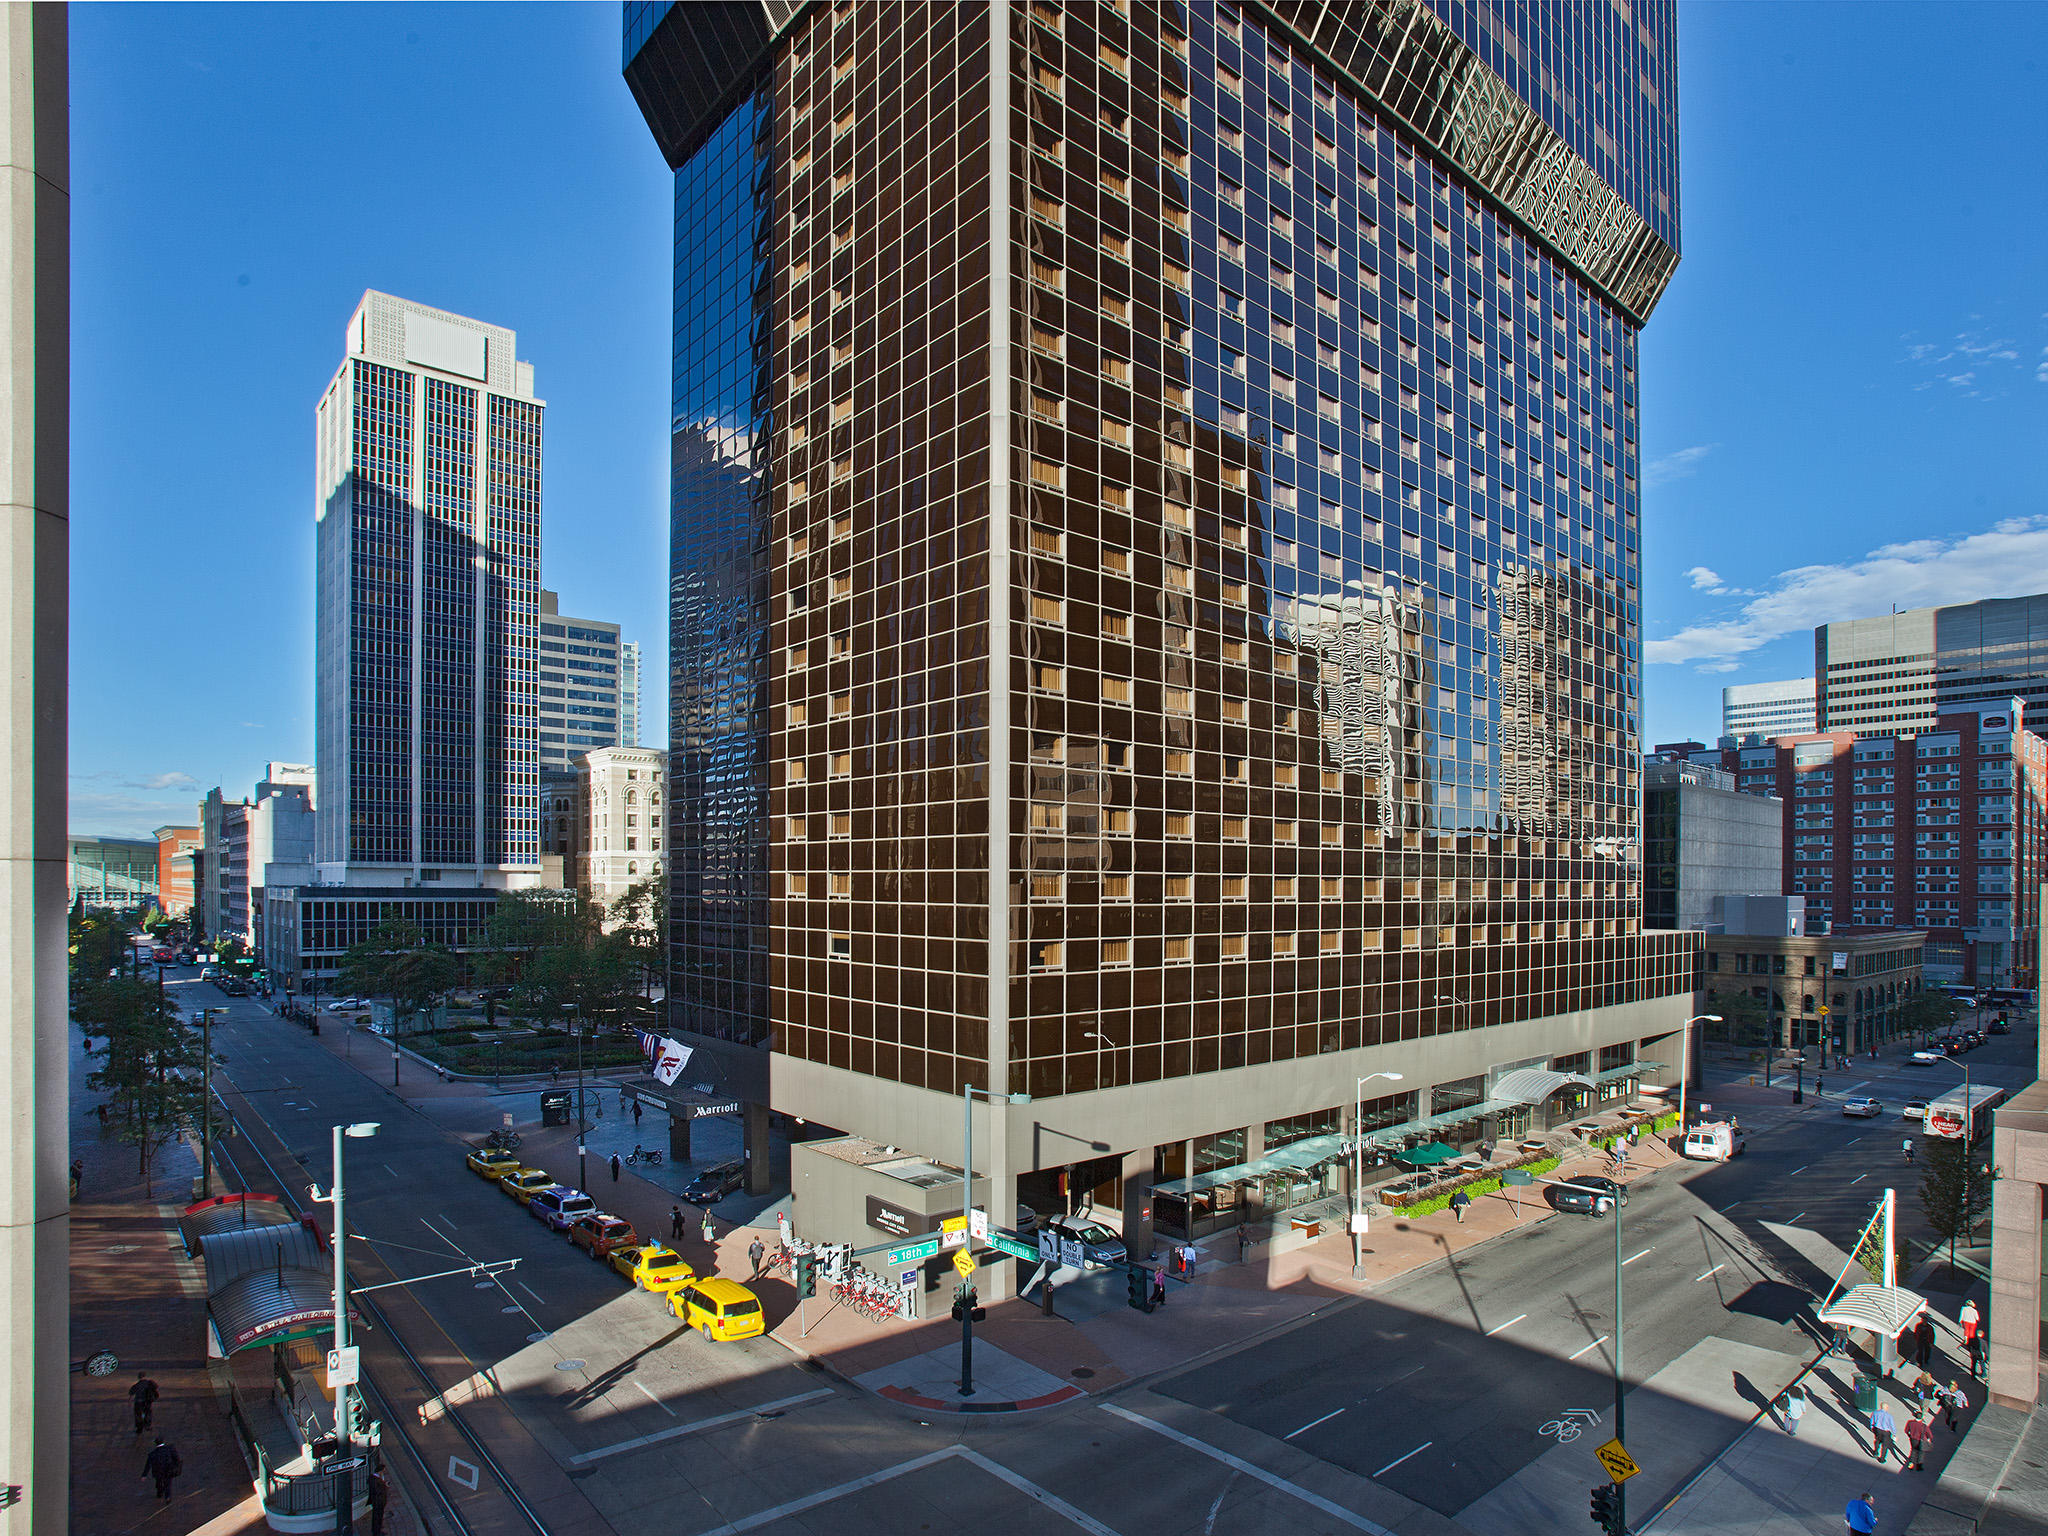 Marriott Hotels Downtown Denver